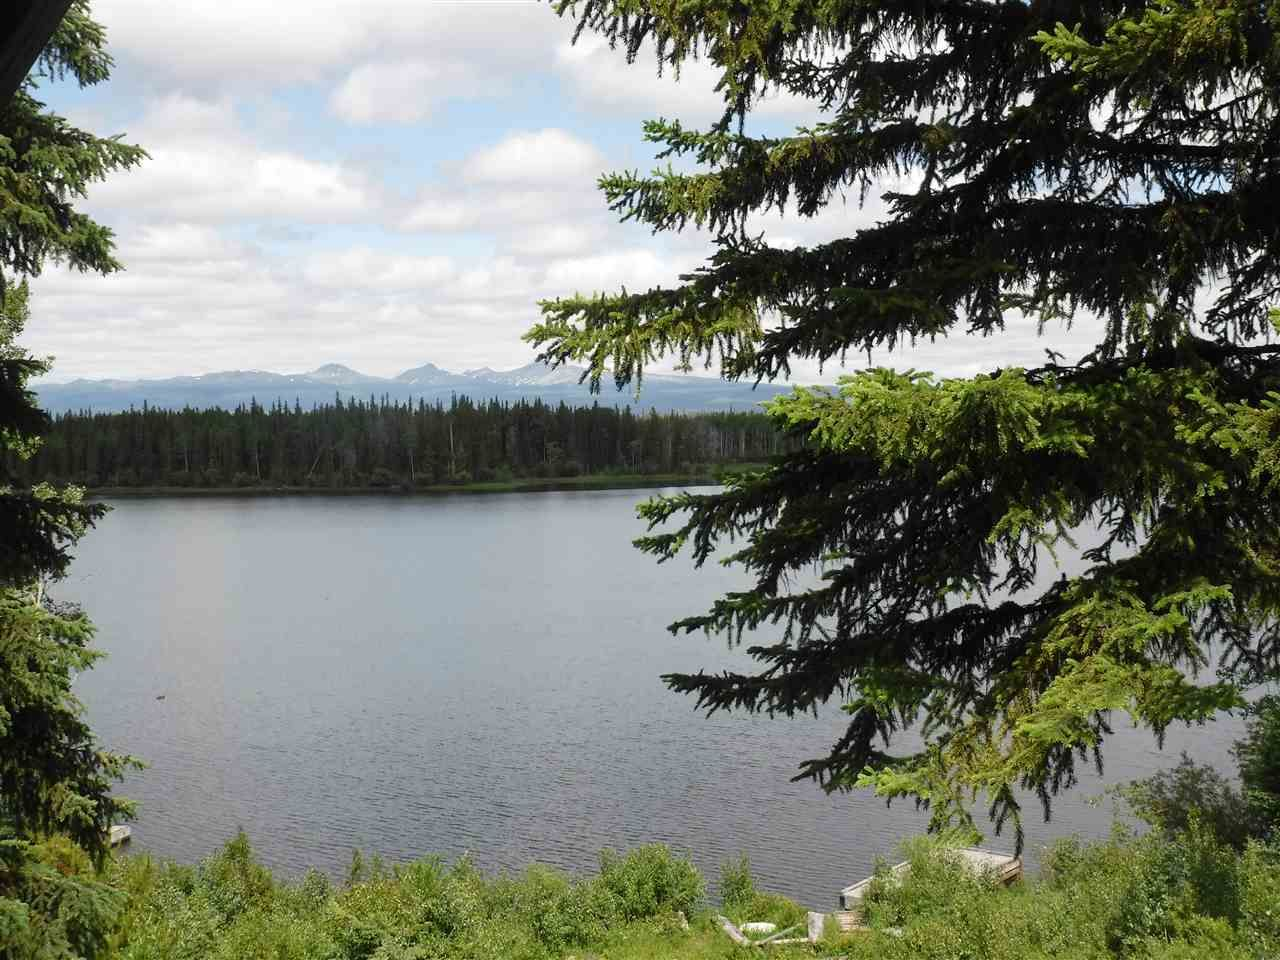 Photo 17: Photos: 3056 ELSEY Road in Williams Lake: Williams Lake - Rural West House for sale (Williams Lake (Zone 27))  : MLS®# R2472269